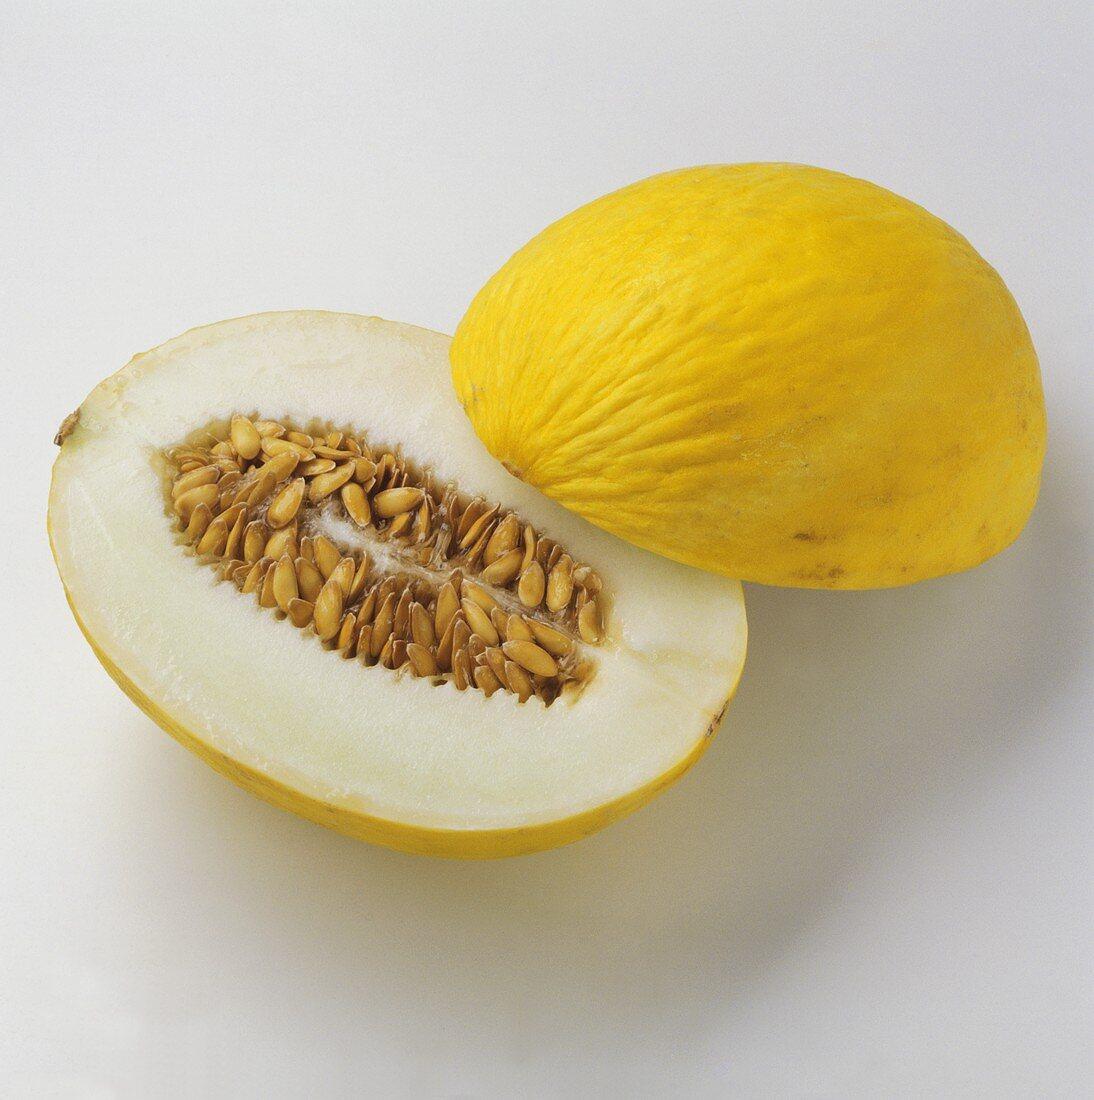 Honeydew melon, halved